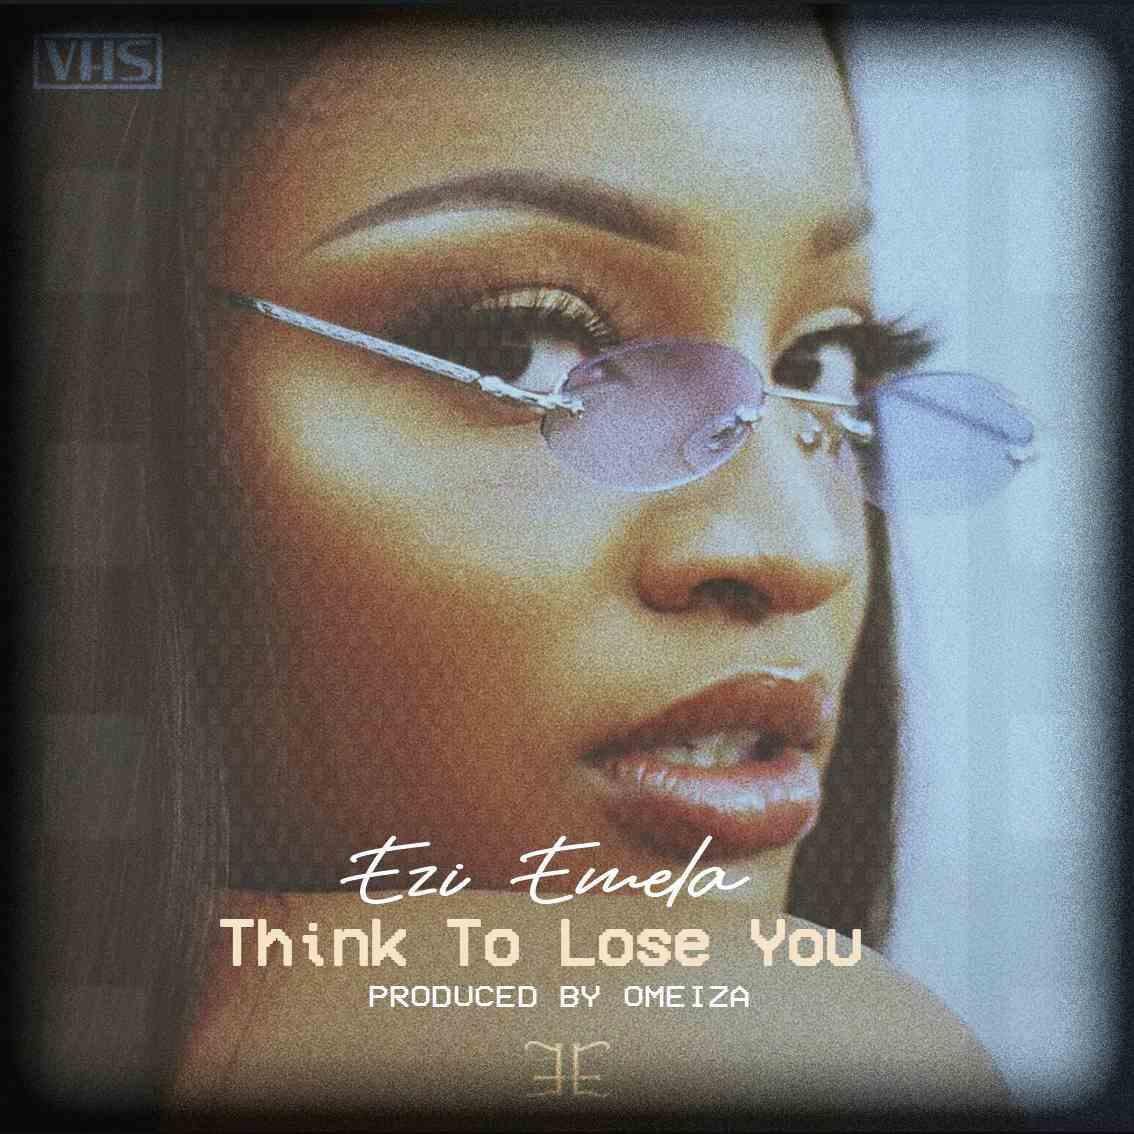 New Music: Ezi Emela - Think To Lose You